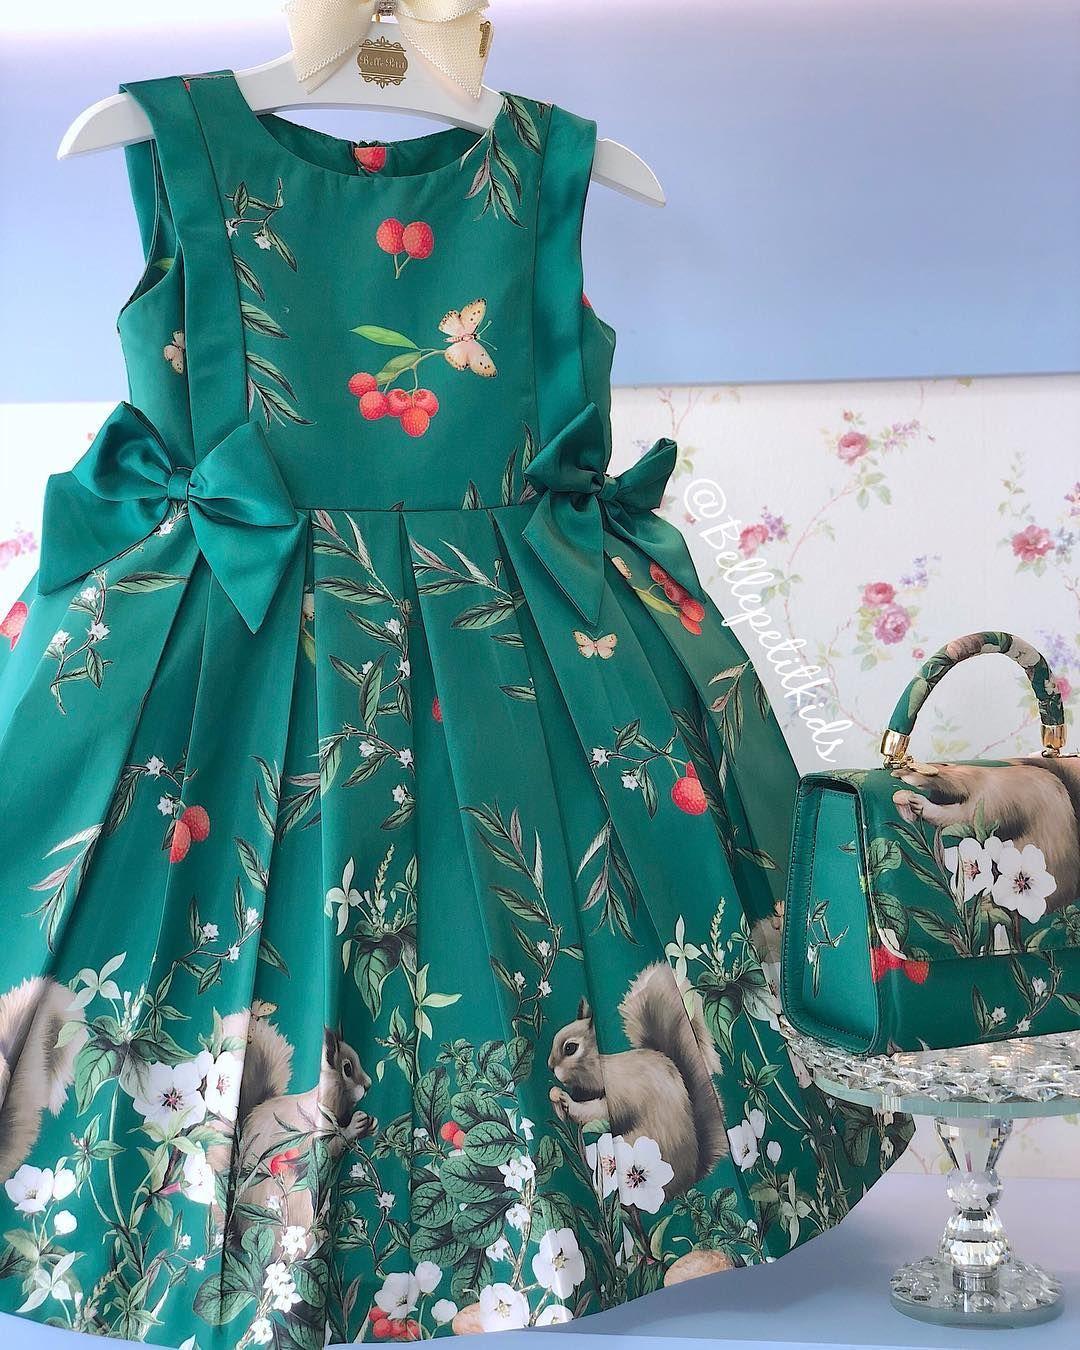 6b84b95a7 Um sonho de vestido! 💚 Lindeza demaaaaaaais define esse vestido ...